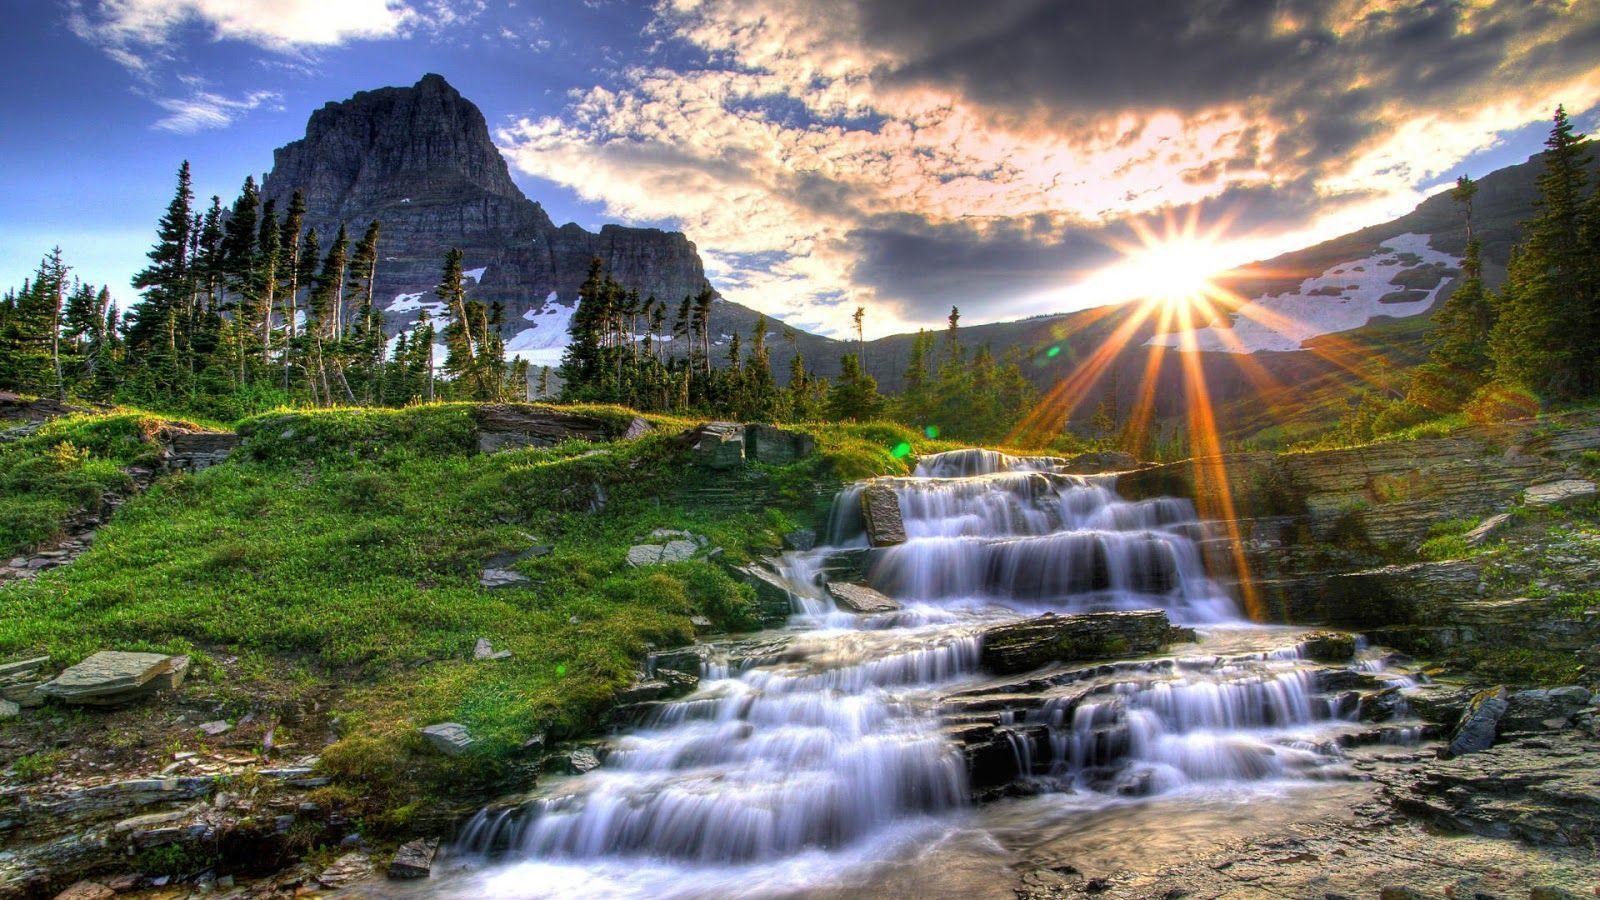 Doğa Resimleri, Doğa Resmi, Doğa Resimler, Doğa Resim, Doğa Fotoğraf, Doğa Fotoğrafları, Doğa Fotoğrafı, Doğa Fotoğraflar, Doğa Foto, Doğa Fotosu, Doğa Fotoları, Doğa Fotolar, Doğa Wallpaper, Doğa Arkaplan, Doğa Arkaplanlar, Doğa Arkaplanları, Doğa Arkaplanı, Doğa Arka Plan, Doğa Arka Planlar, Doğa Arka Planı, Doğa Arka Planları, Doğa Masaüstü, Doğa Masaüstü Resimleri, Doğa Masaüstü Fotoğrafları, Doğa Masaüstü Fotoları, Doğa Masaüstü Arkaplanları, Doğa Masaüstü Arka Planları, Doğa Duvar Kağıtları, Manzara Resimleri, Manzara Resmi, Manzara Resimler, Manzara Resim, Manzara Fotoğraf, Manzara Fotoğrafları, Manzara Fotoğrafı, Manzara Fotoğraflar, Manzara Foto, Manzara Fotosu, Manzara Fotoları, Manzara Fotolar, Manzara Wallpaper, Manzara Arkaplan, Manzara Arkaplanlar, Manzara Arkaplanları, Manzara Arkaplanı, Manzara Arka Plan, Manzara Arka Planlar, Manzara Arka Planı, Manzara Arka Planları, Manzara Masaüstü, Manzara Masaüstü Resimleri, Manzara Masaüstü Fotoğrafları, Manzara Masaüstü Fotoları, Manzara Masaüstü Arkaplanları, Manzara Masaüstü Arka Planları, Manzara Duvar Kağıtları, Tabiat Resimleri, Tabiat Resmi, Tabiat Resimler, Tabiat Resim, Tabiat Fotoğraf, Tabiat Fotoğrafları, Tabiat Fotoğrafı, Tabiat Fotoğraflar, Tabiat Foto, Tabiat Fotosu, Tabiat Fotoları, Tabiat Fotolar, Tabiat Wallpaper, Tabiat Arkaplan, Tabiat Arkaplanlar, Tabiat Arkaplanları, Tabiat Arkaplanı, Tabiat Arka Plan, Tabiat Arka Planlar, Tabiat Arka Planı, Tabiat Arka Planları, Tabiat Masaüstü, Tabiat Masaüstü Resimleri, Tabiat Masaüstü Fotoğrafları, Tabiat Masaüstü Fotoları, Tabiat Masaüstü Arkaplanları, Tabiat Masaüstü Arka Planları, Tabiat Duvar Kağıtları, Resimleri, Resmi, Resimler, Resim, Fotoğraf, Fotoğrafları, Fotoğrafı, Fotoğraflar, Foto, Fotosu, Fotoları, Fotolar, Wallpaper, Arkaplan, Arkaplanlar, Arkaplanları, Arkaplanı, Arka Plan, Arka Planlar, Arka Planı, Arka Planları, Masaüstü, Masaüstü Resimleri, Masaüstü Fotoğrafları, Masaüstü Fotoları, Masaüstü Arkaplanları, Masaüstü Arka Planları, Duvar